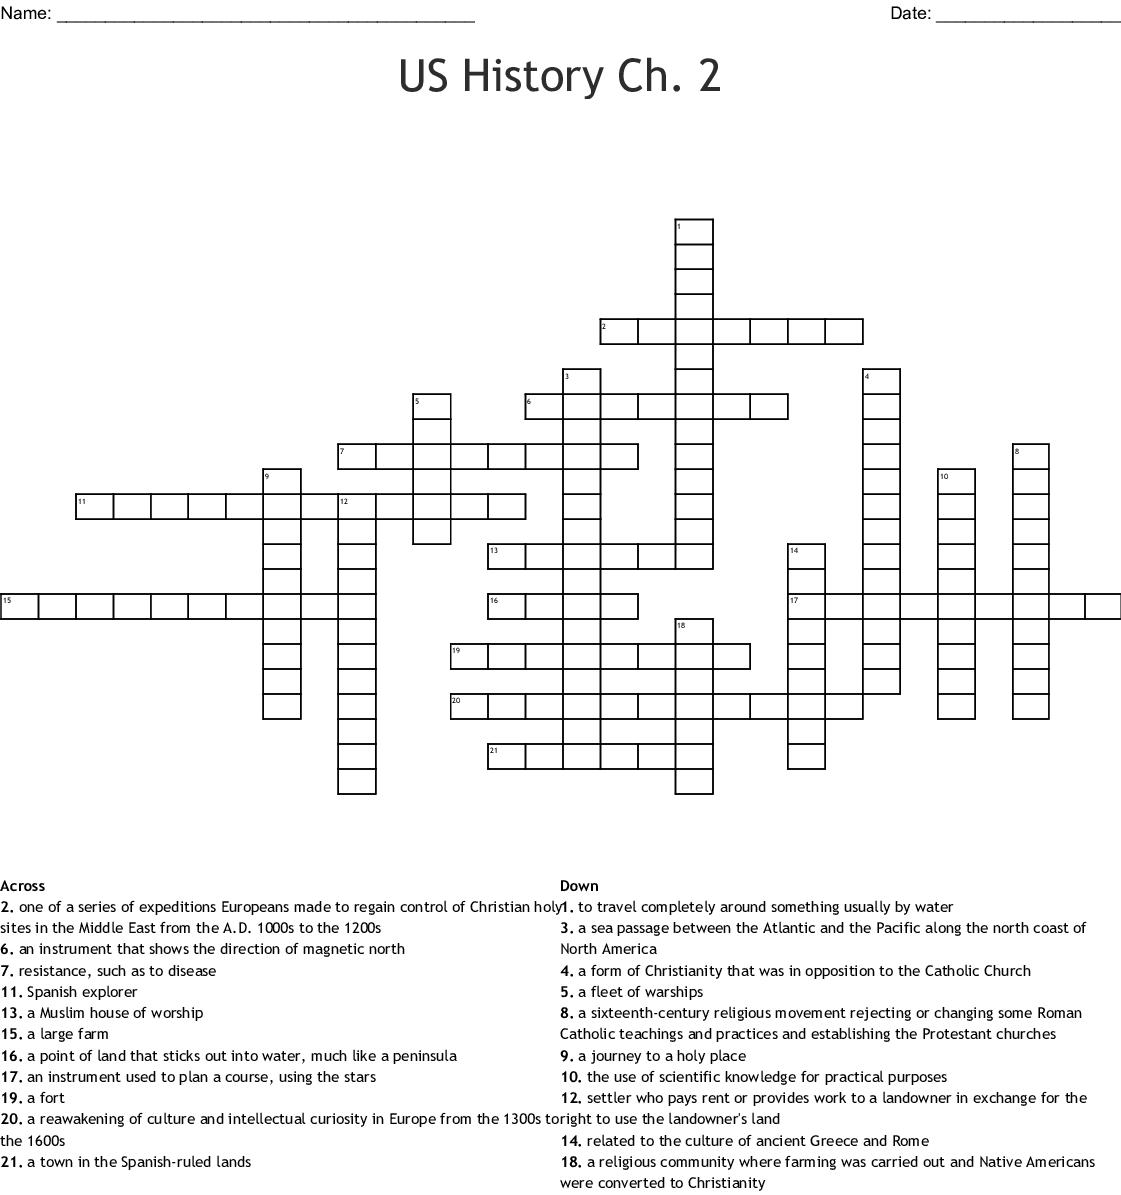 US History Ch. 2 Crossword - WordMint